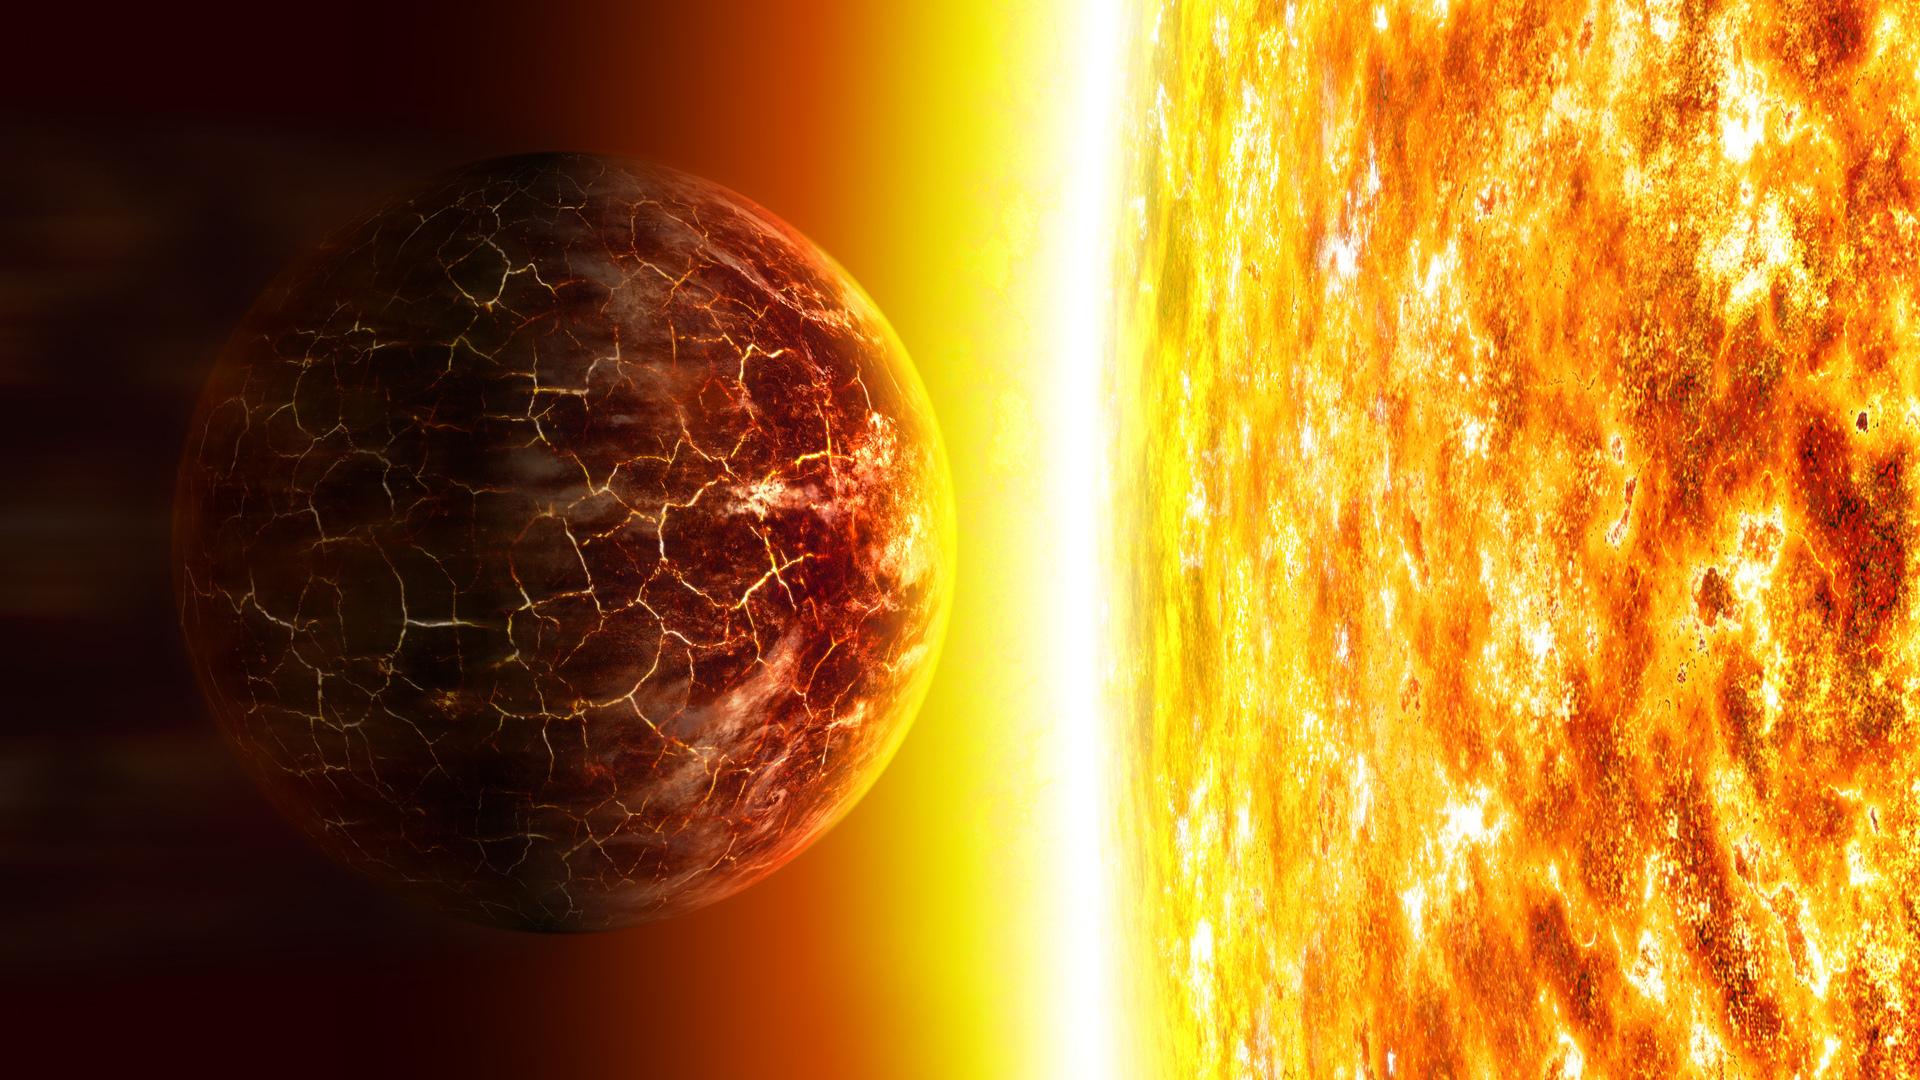 Света жопа как планета 14 фотография